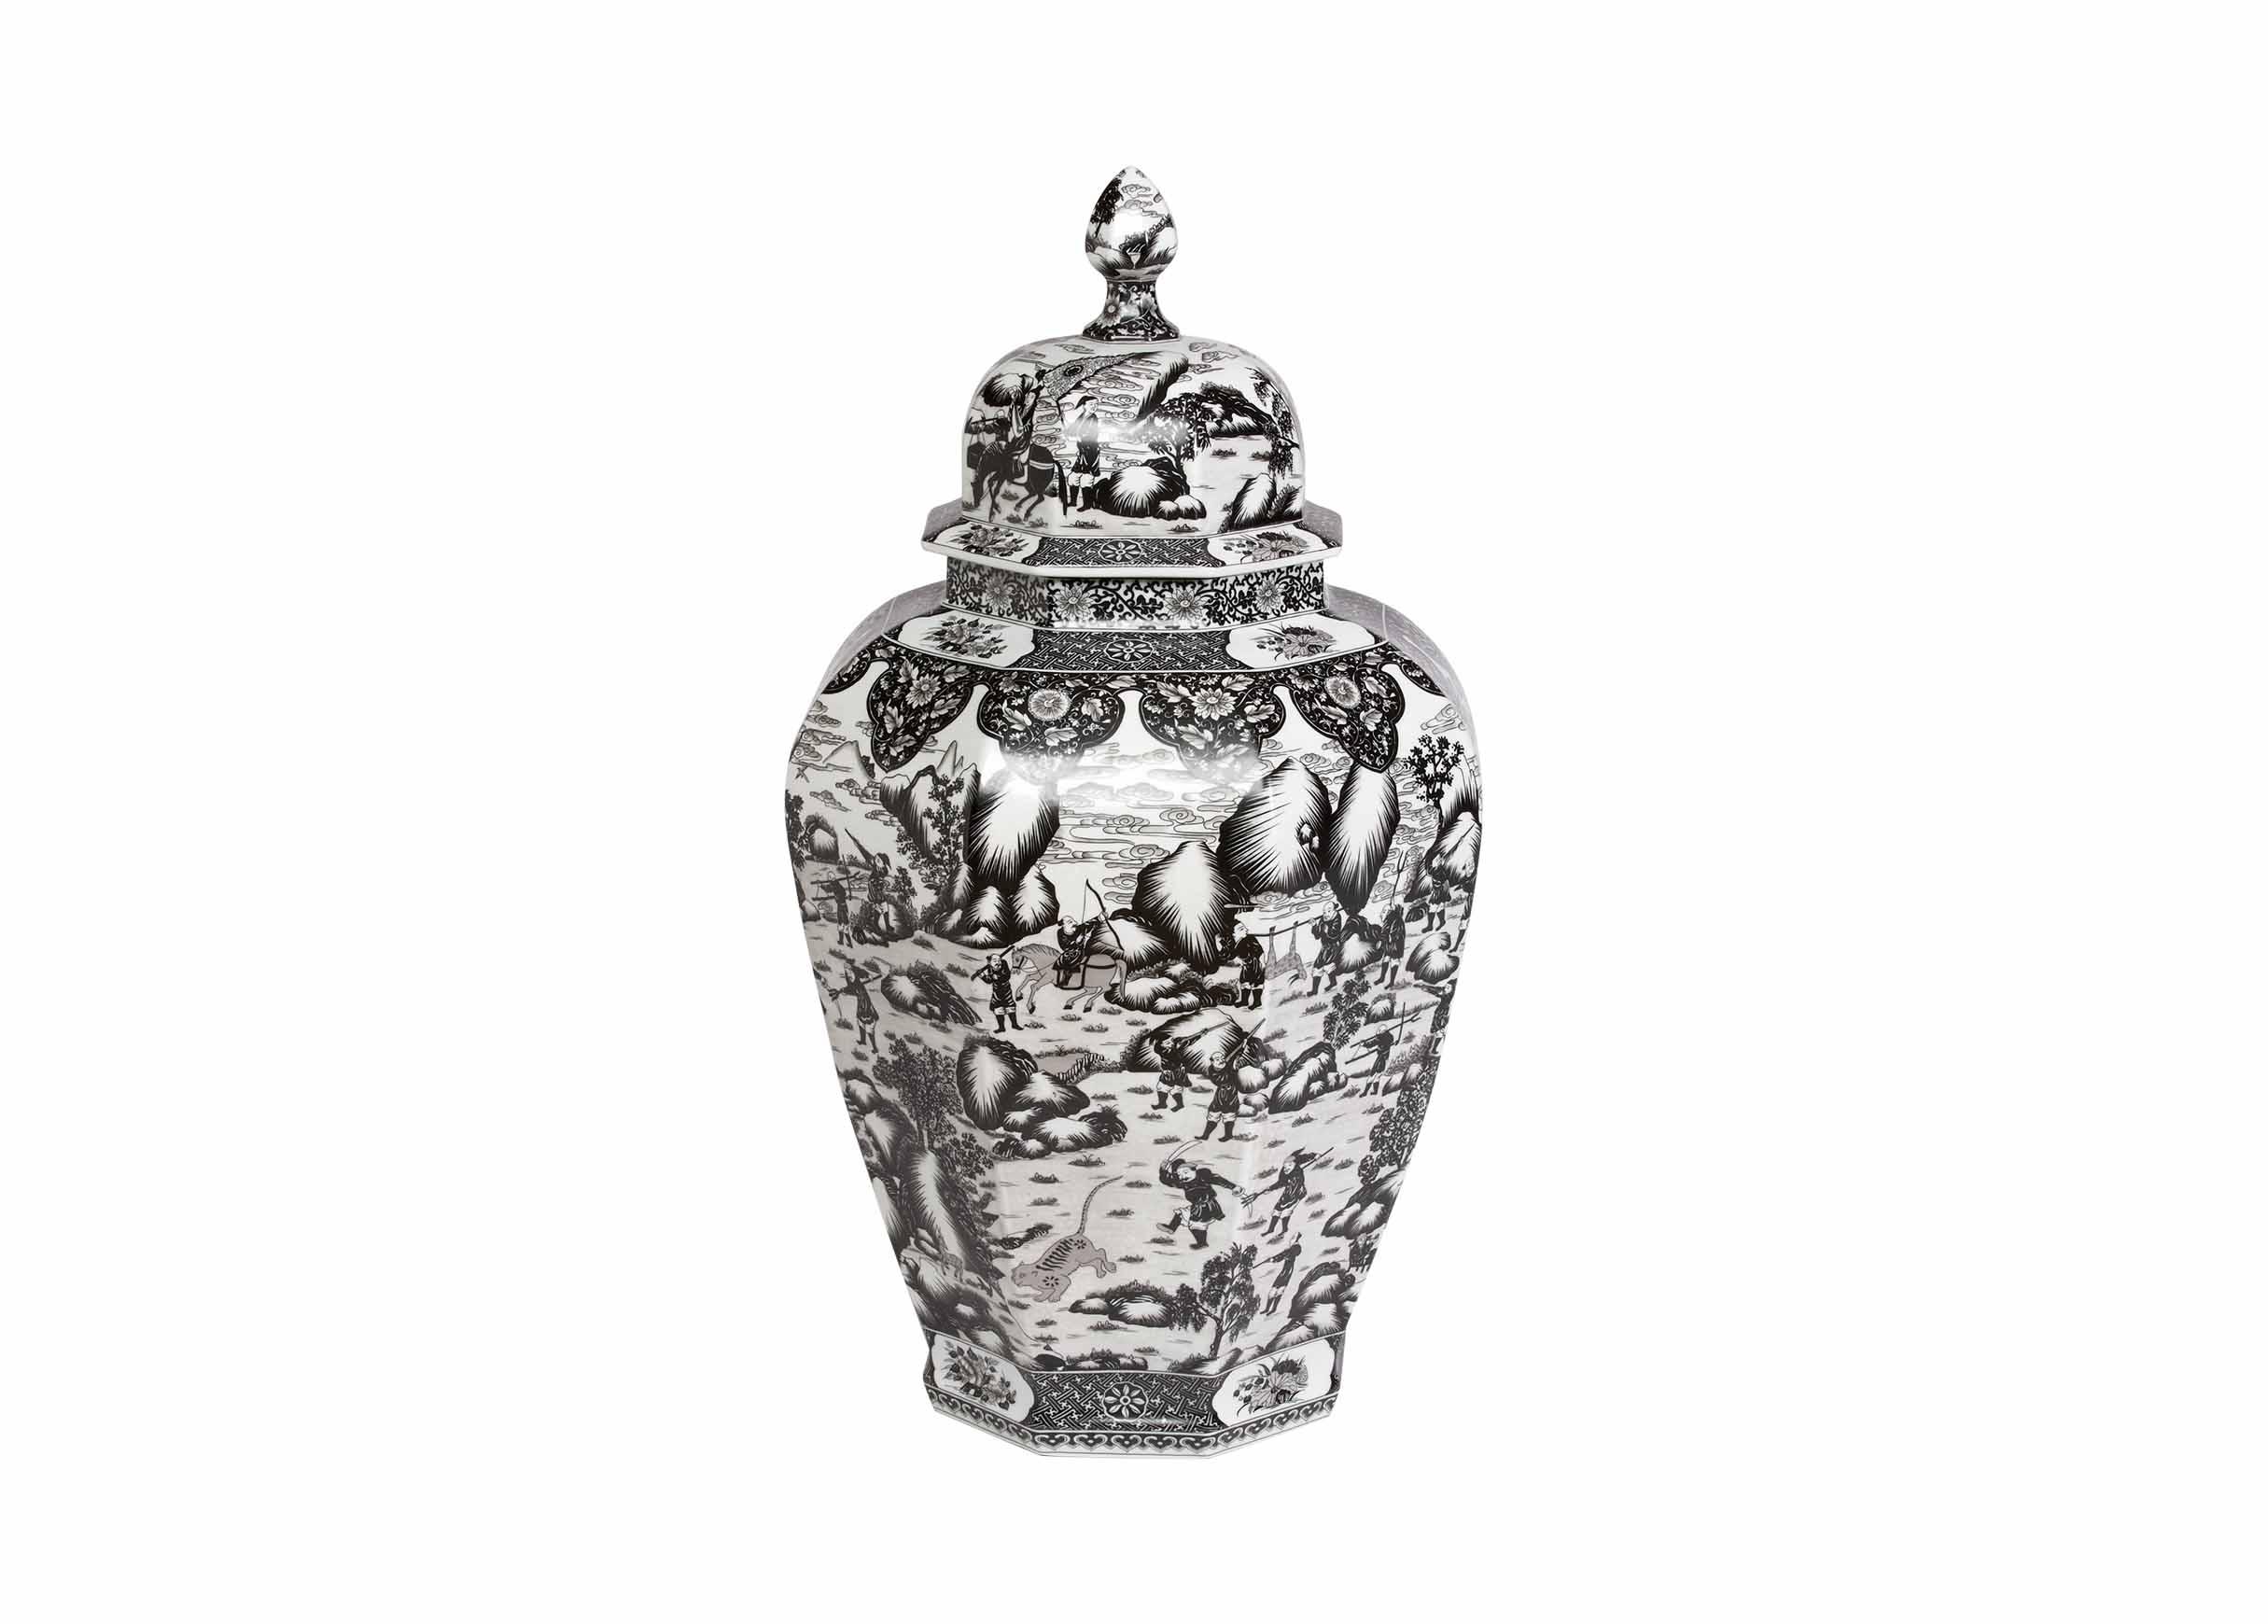 Lovely Extra Large Black and White Ginger Jar | Bottles & Jars | Ethan Allen WB14